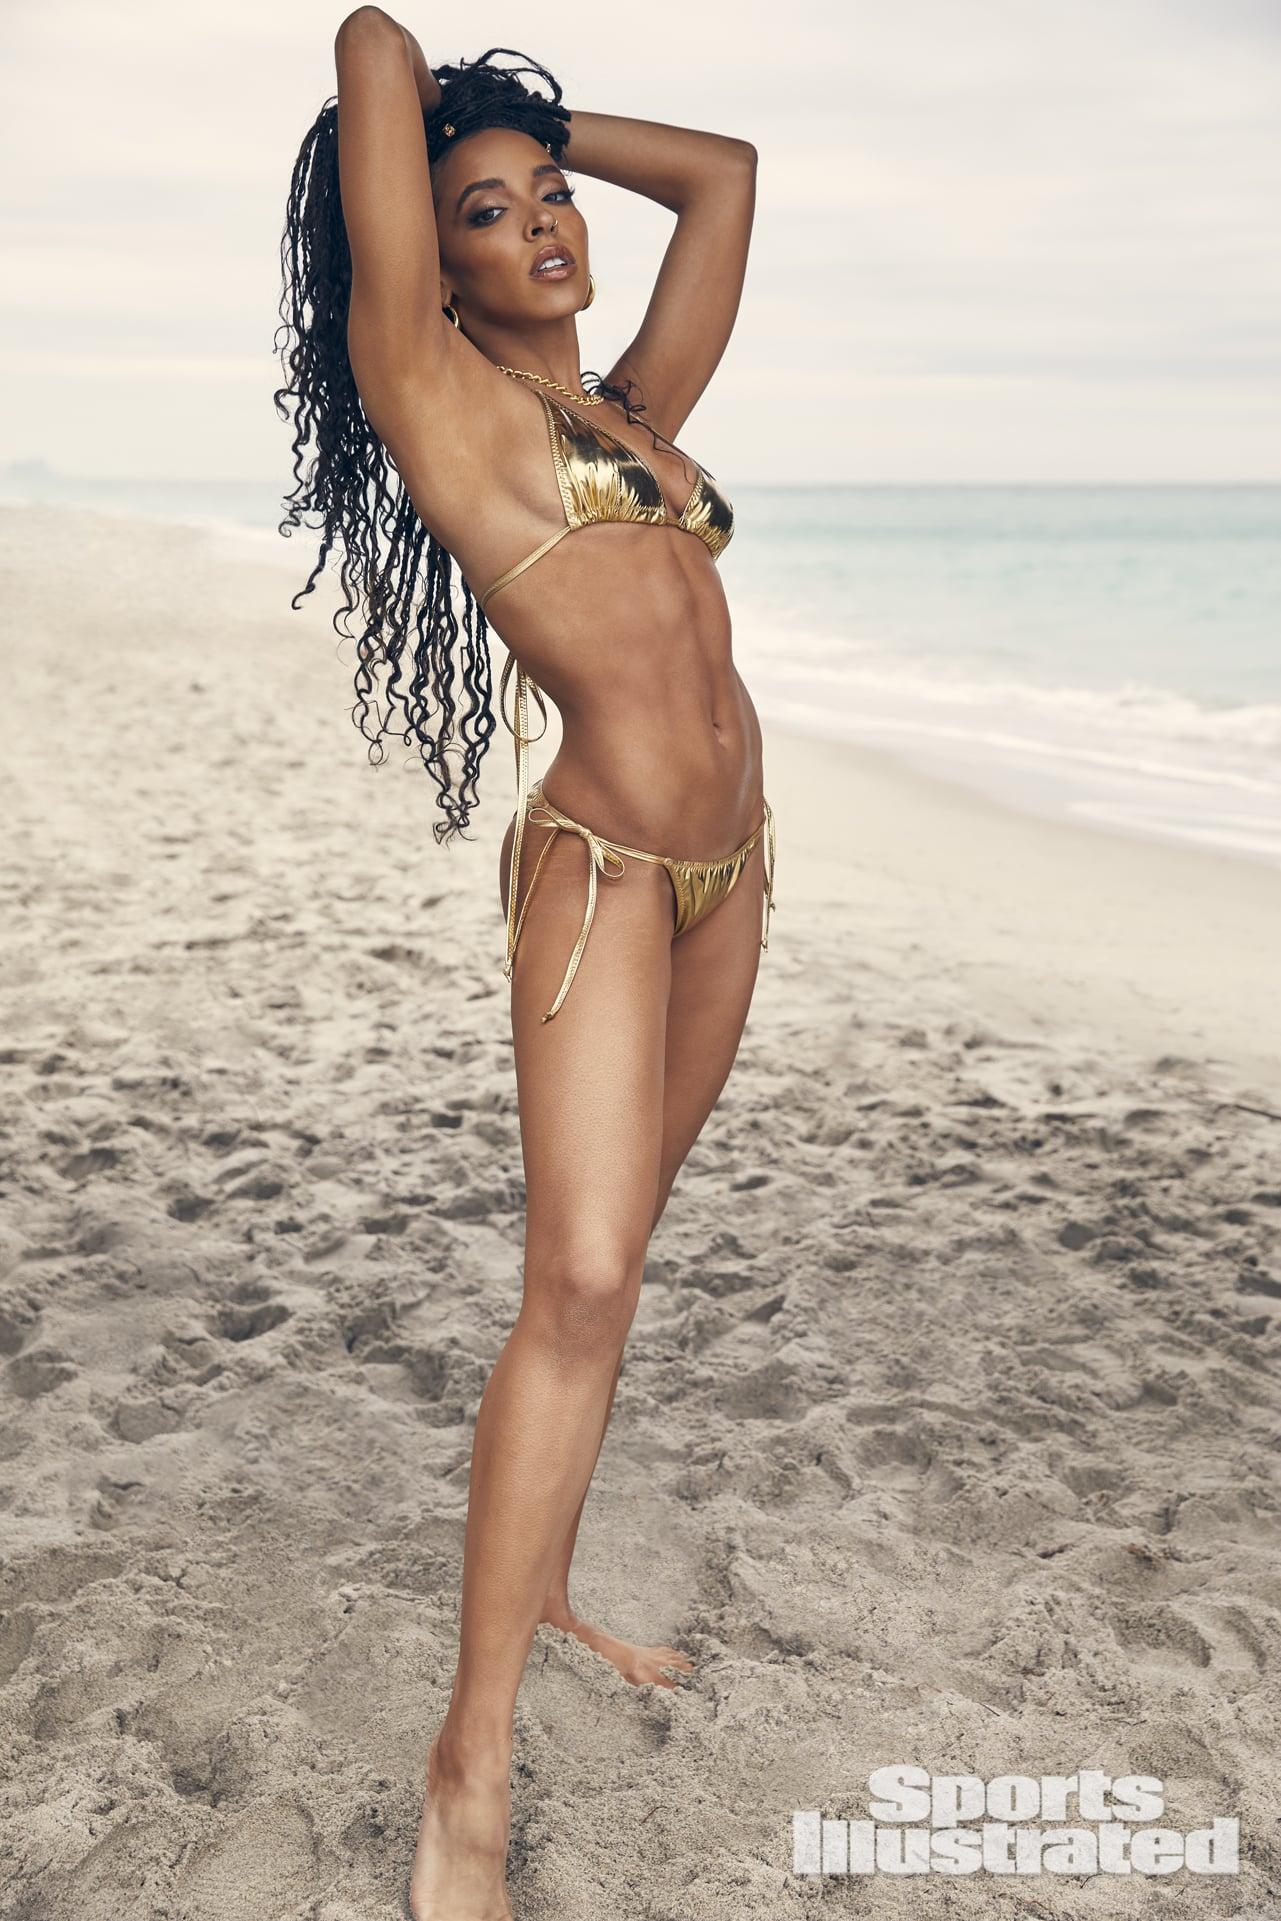 Swimsuit 2021: Hollywood Florida Tinashe NA 1/17/2021 X163502 TK7 Credit: James Macari